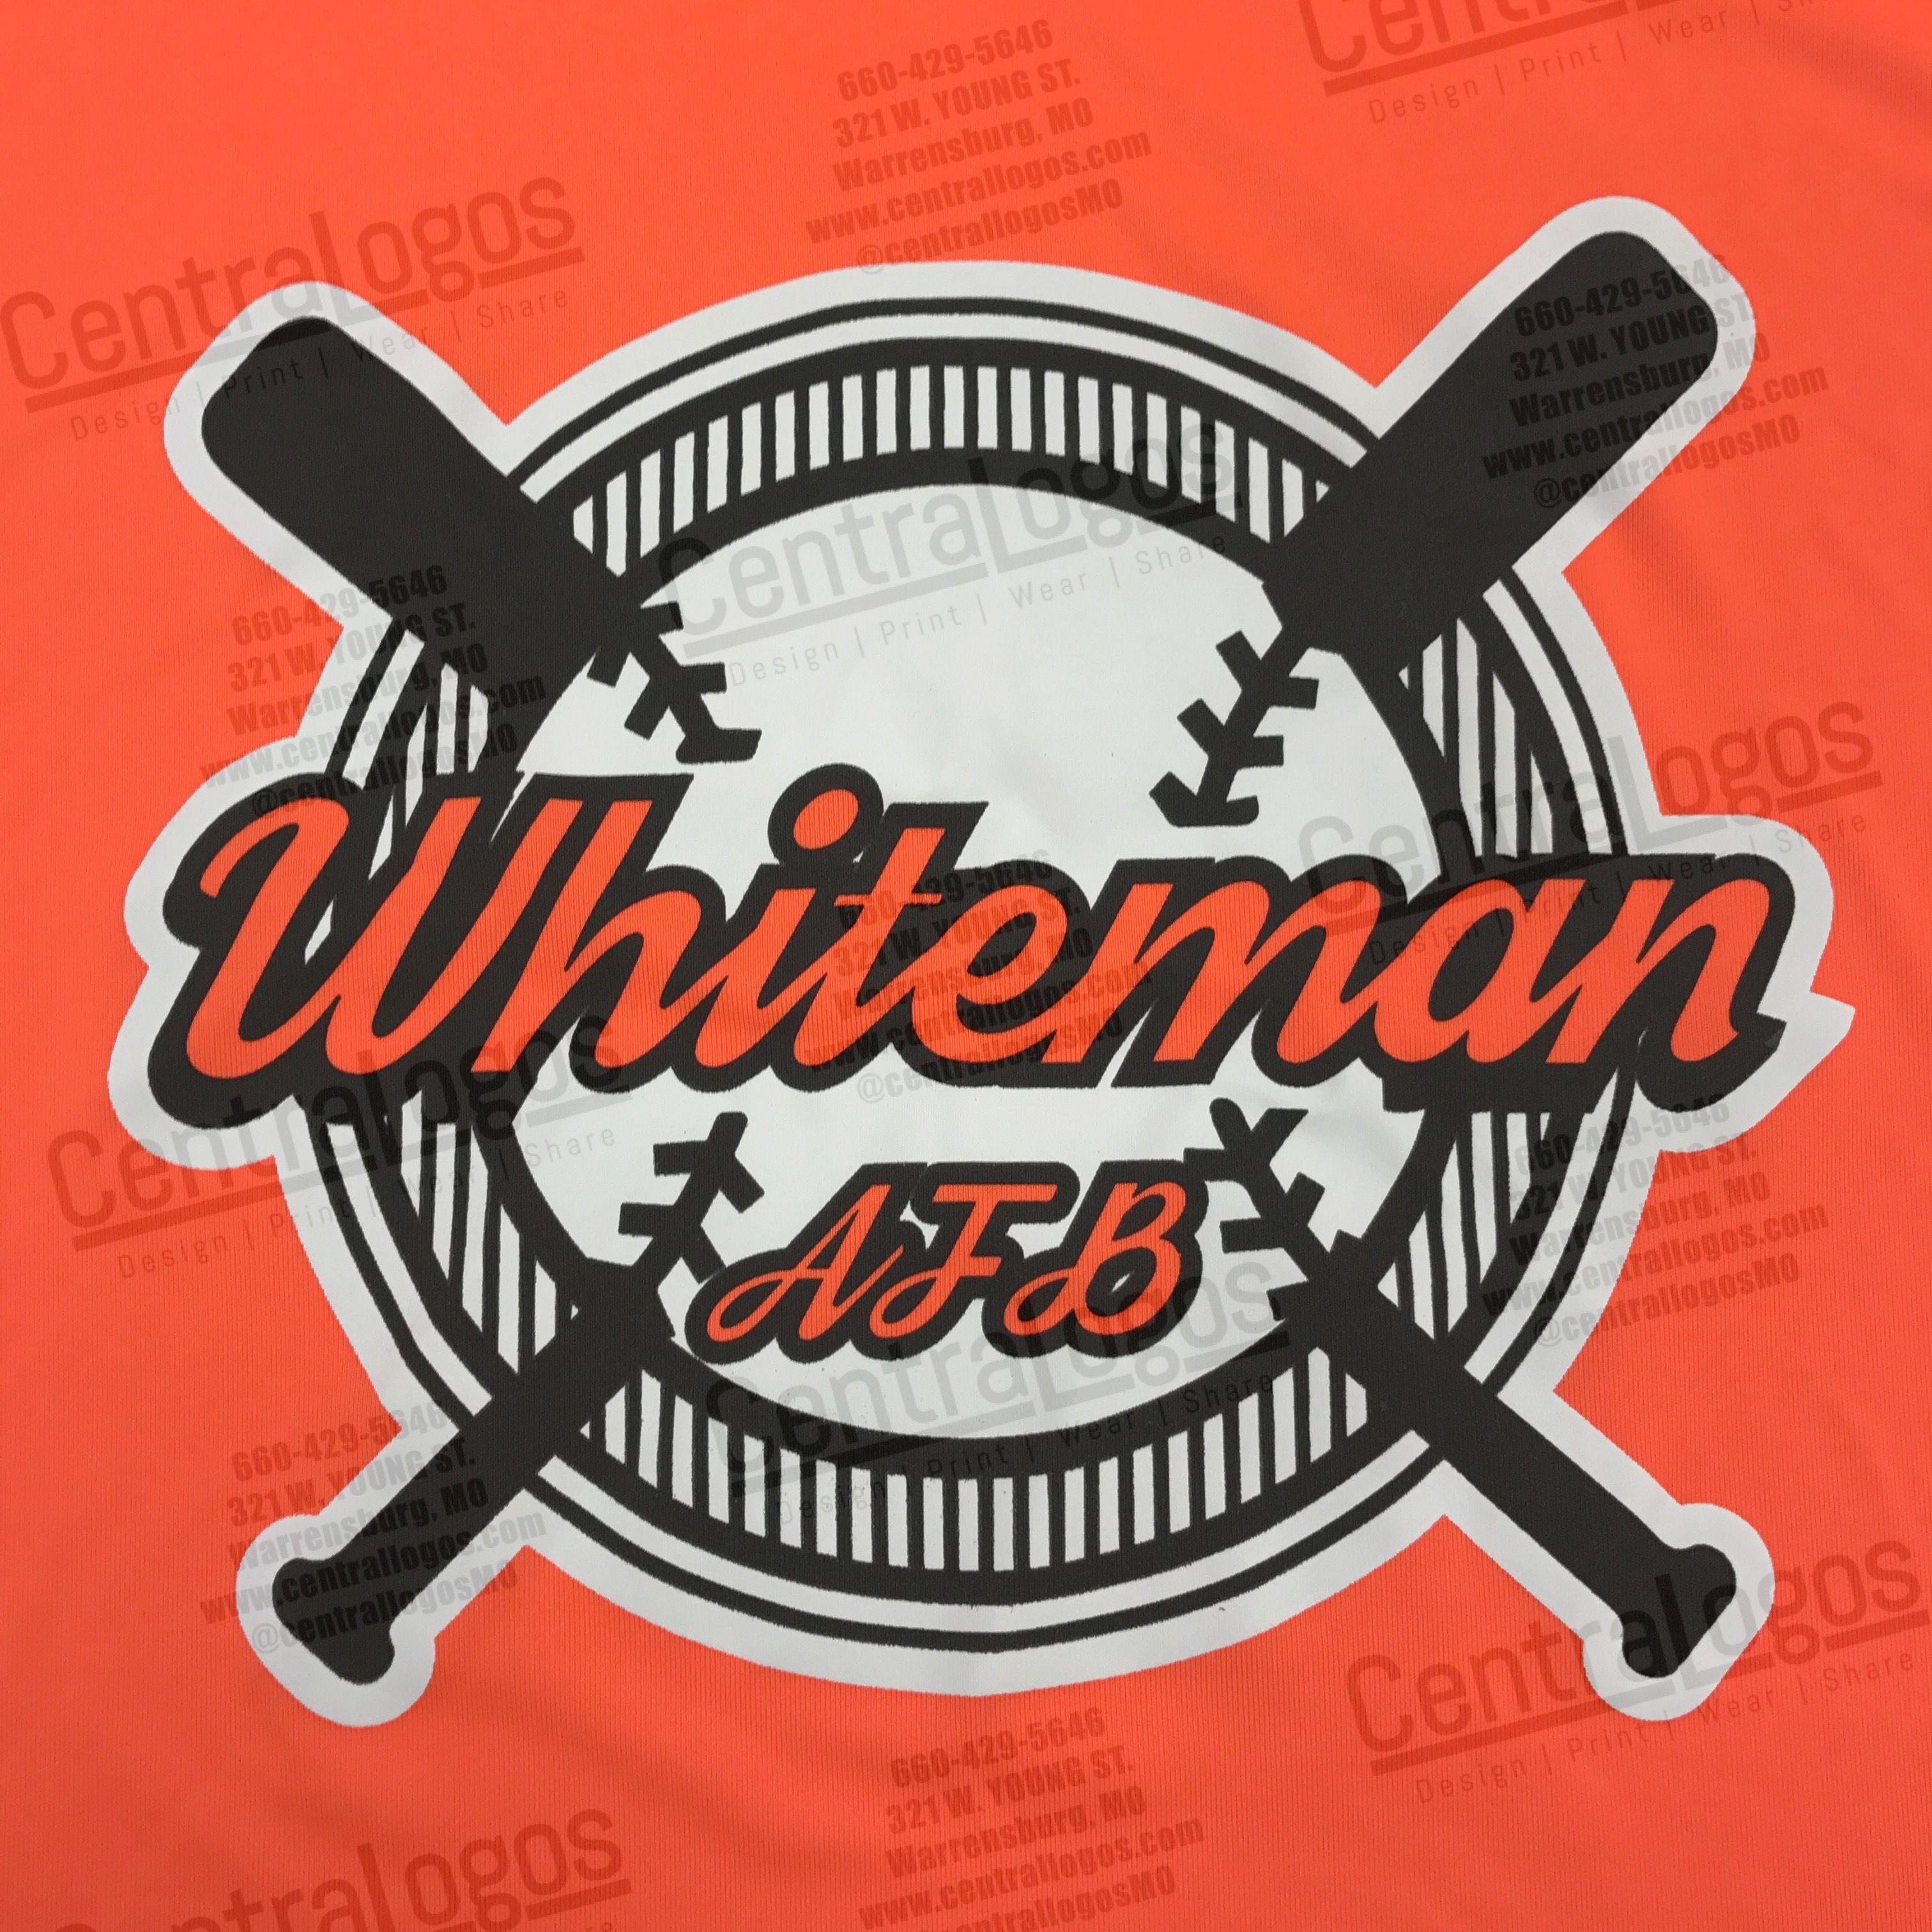 Shirts printed for Whiteman Air Force Base Softball.